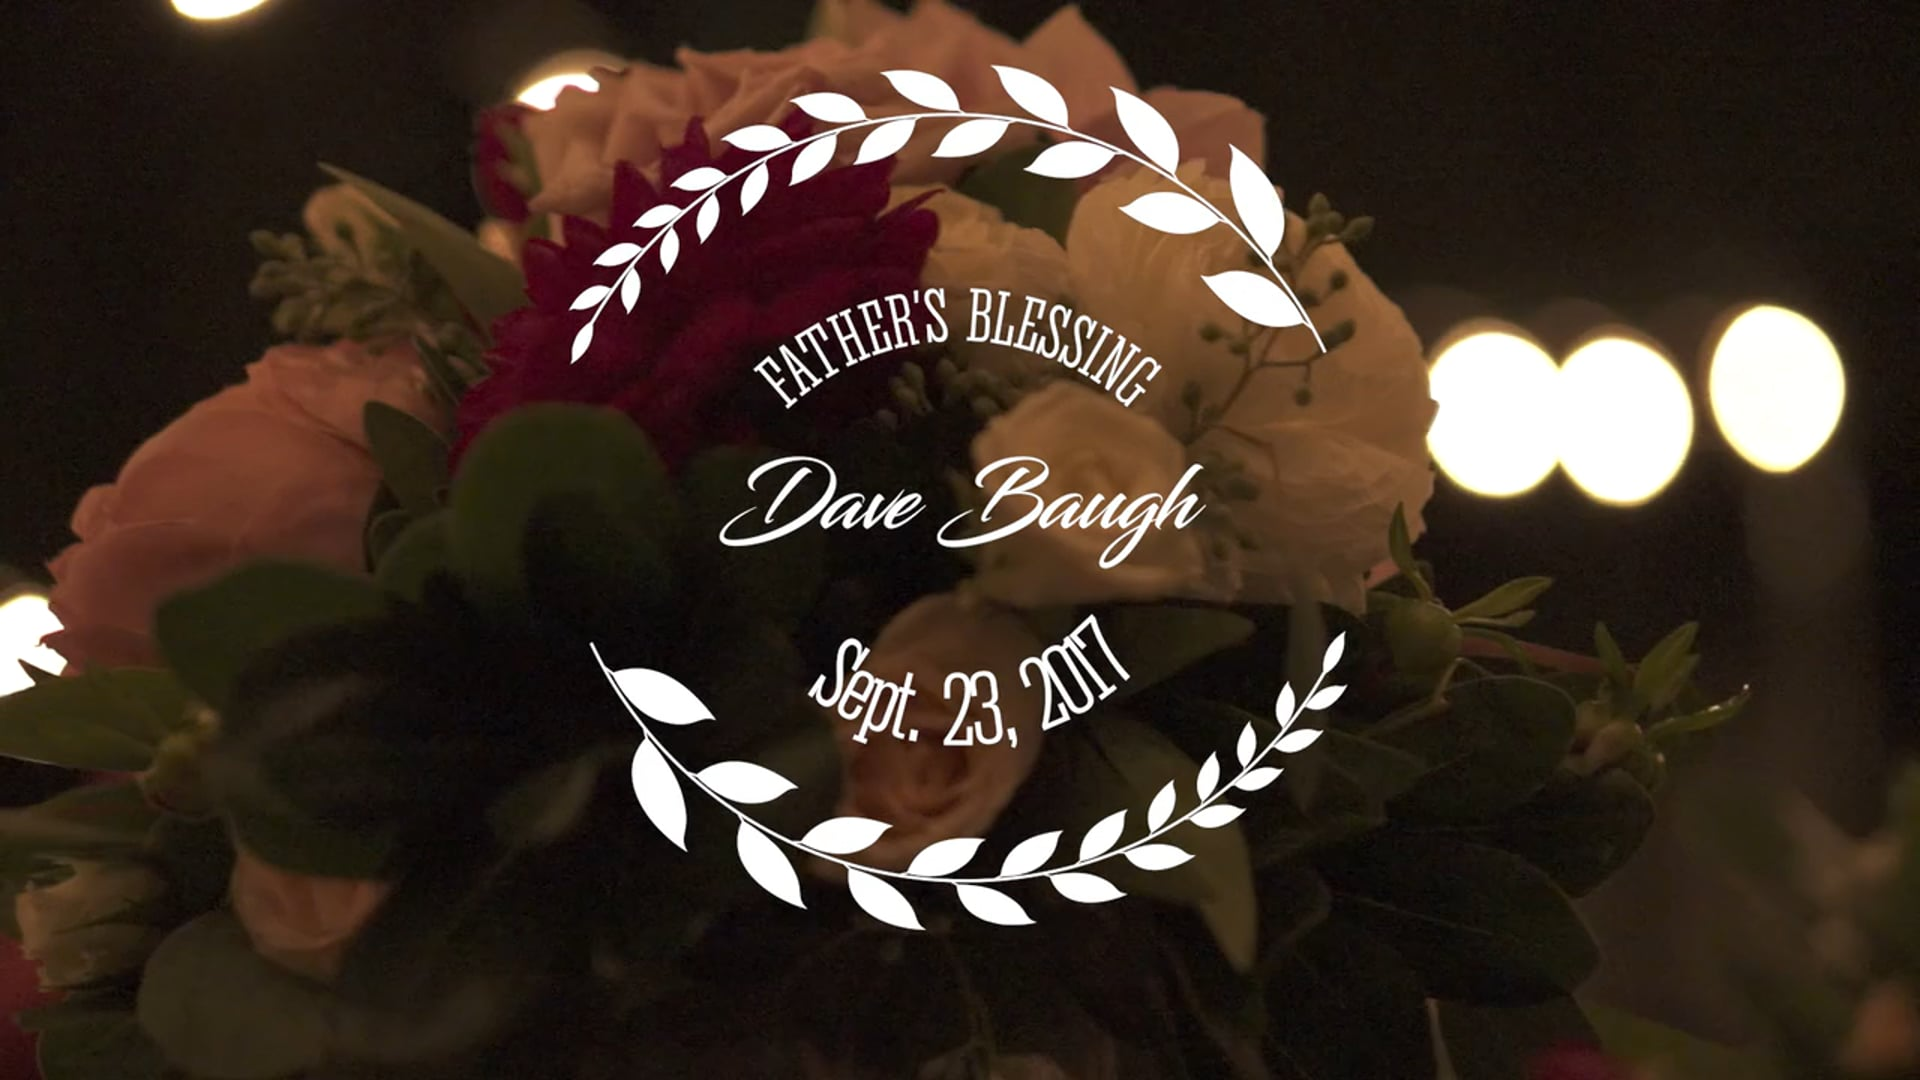 Melissa + Erik Prosser Wedding - Dad's Blessing